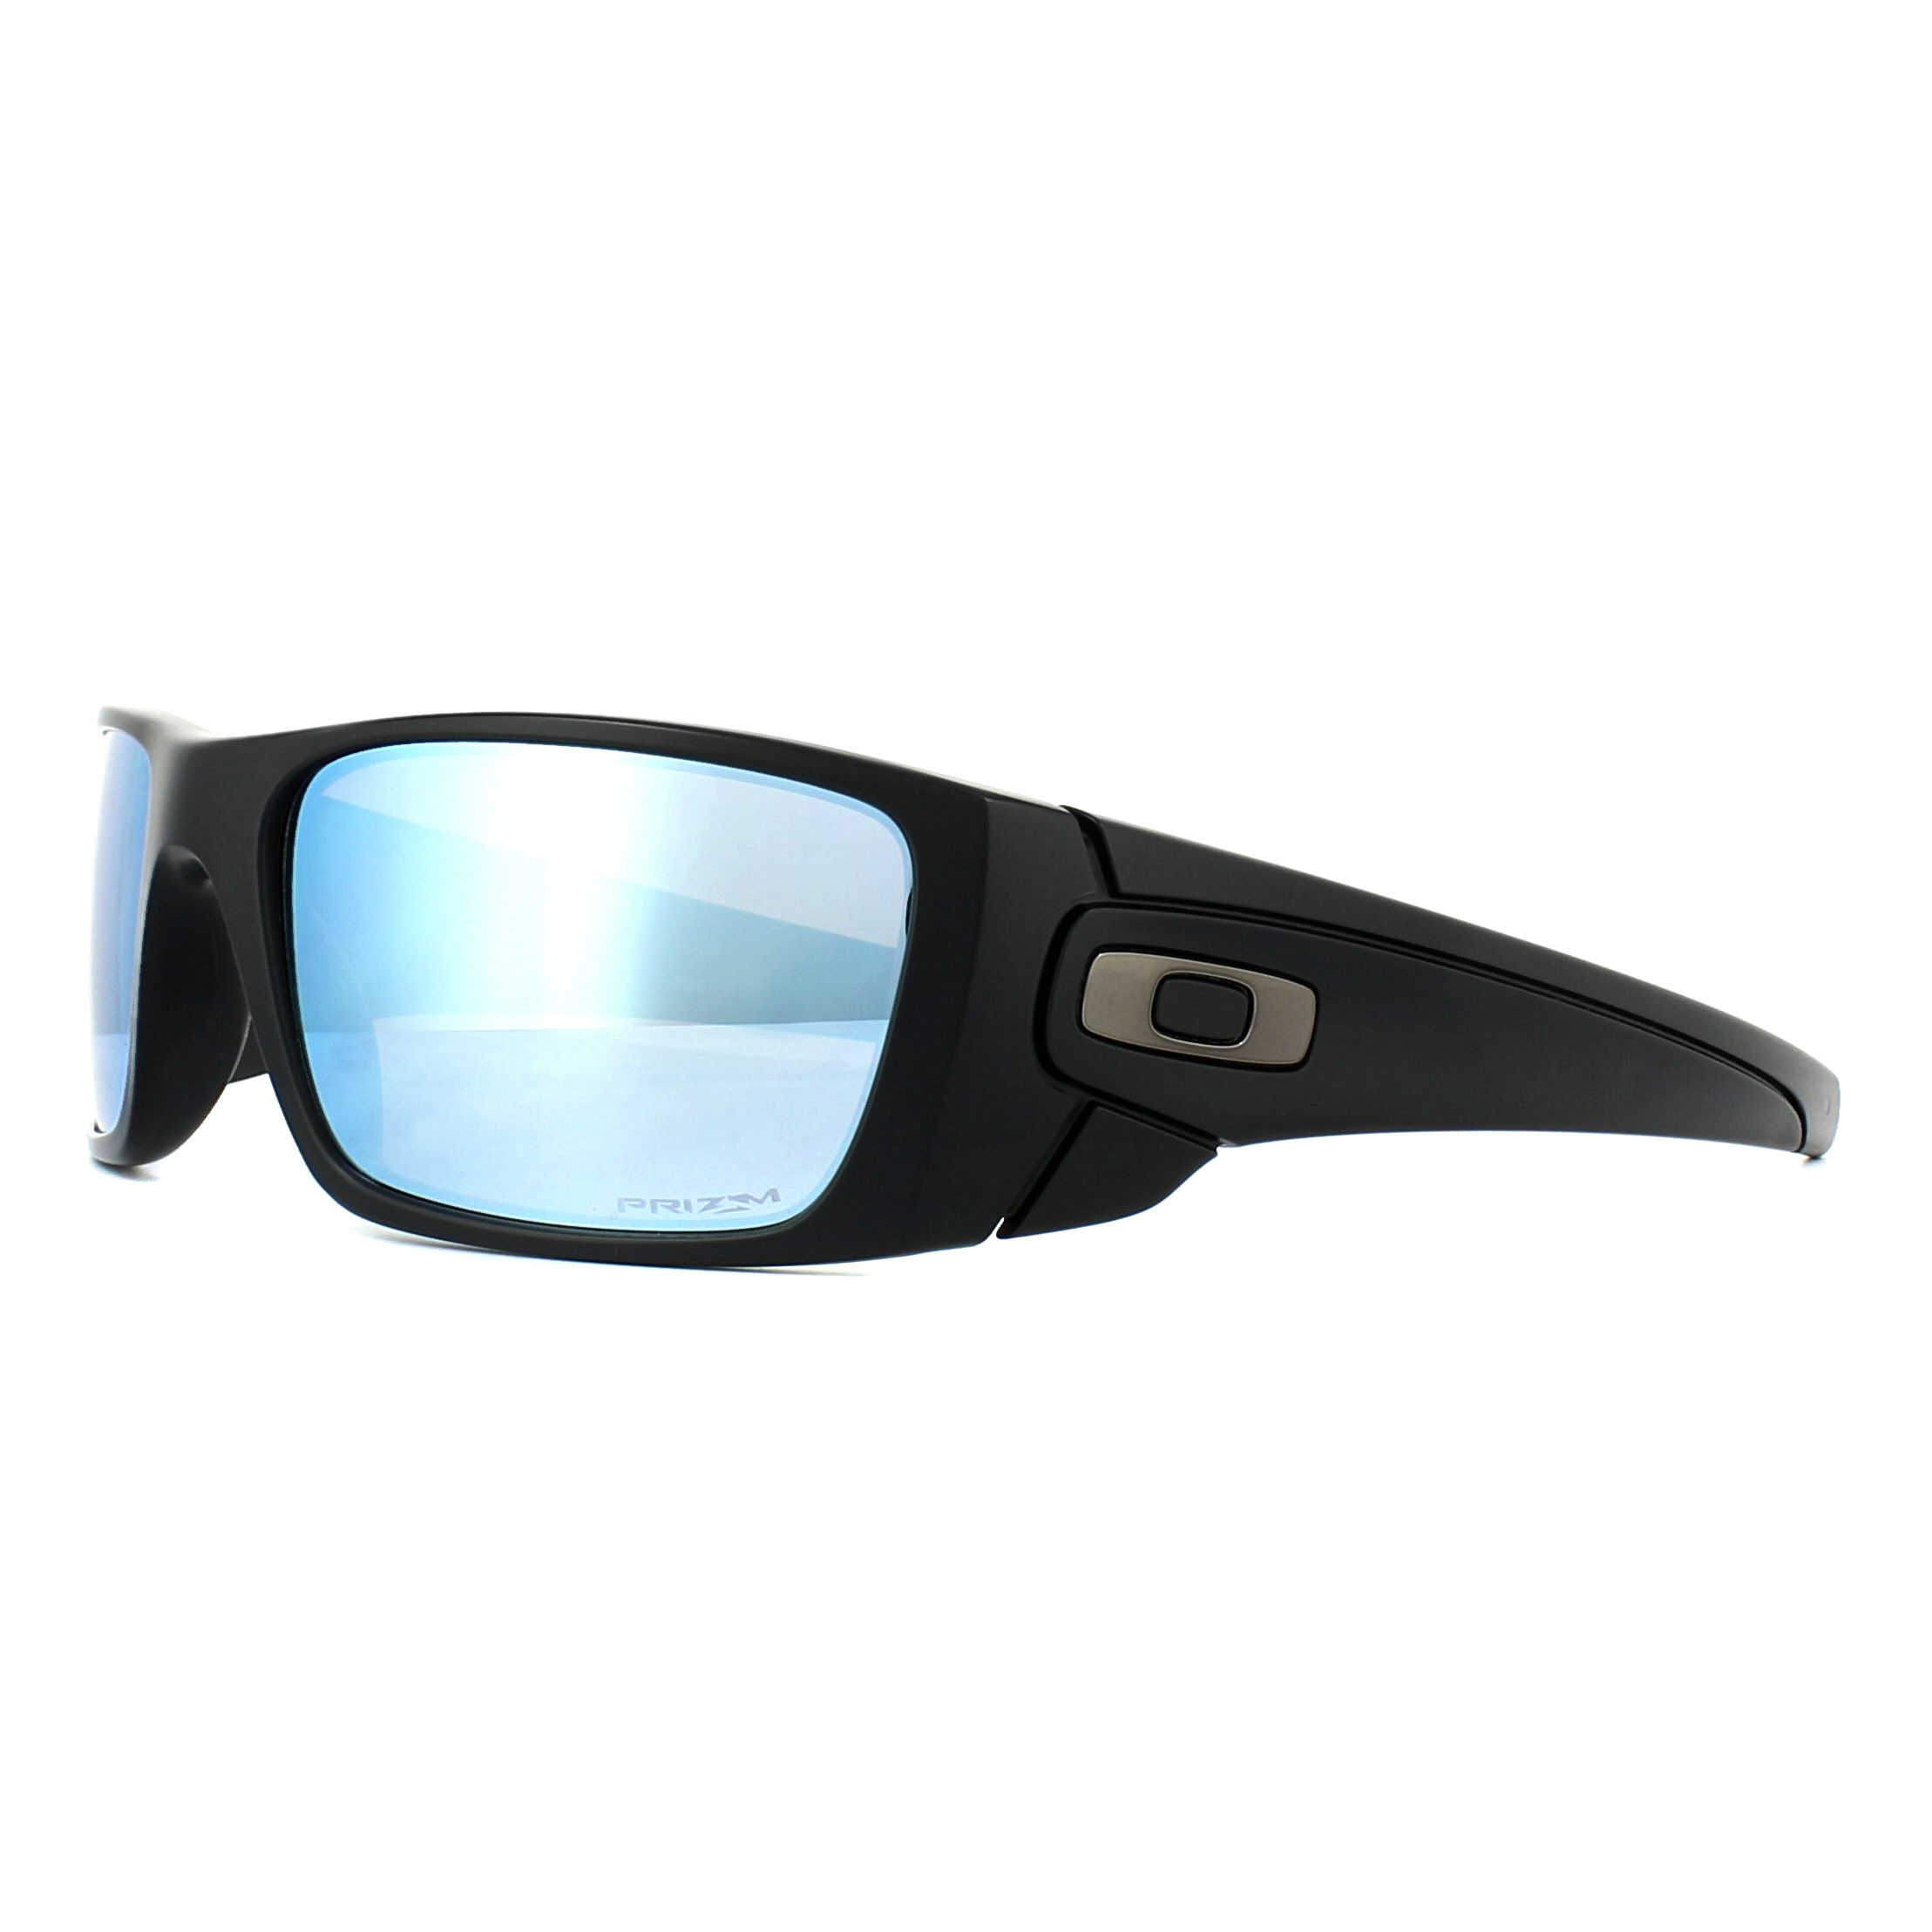 40e768f3eec ... wholesale sentinel oakley sunglasses fuel cell oo9096 d8 matt black  prizm deep water polarized c6d29 d2da2 ...